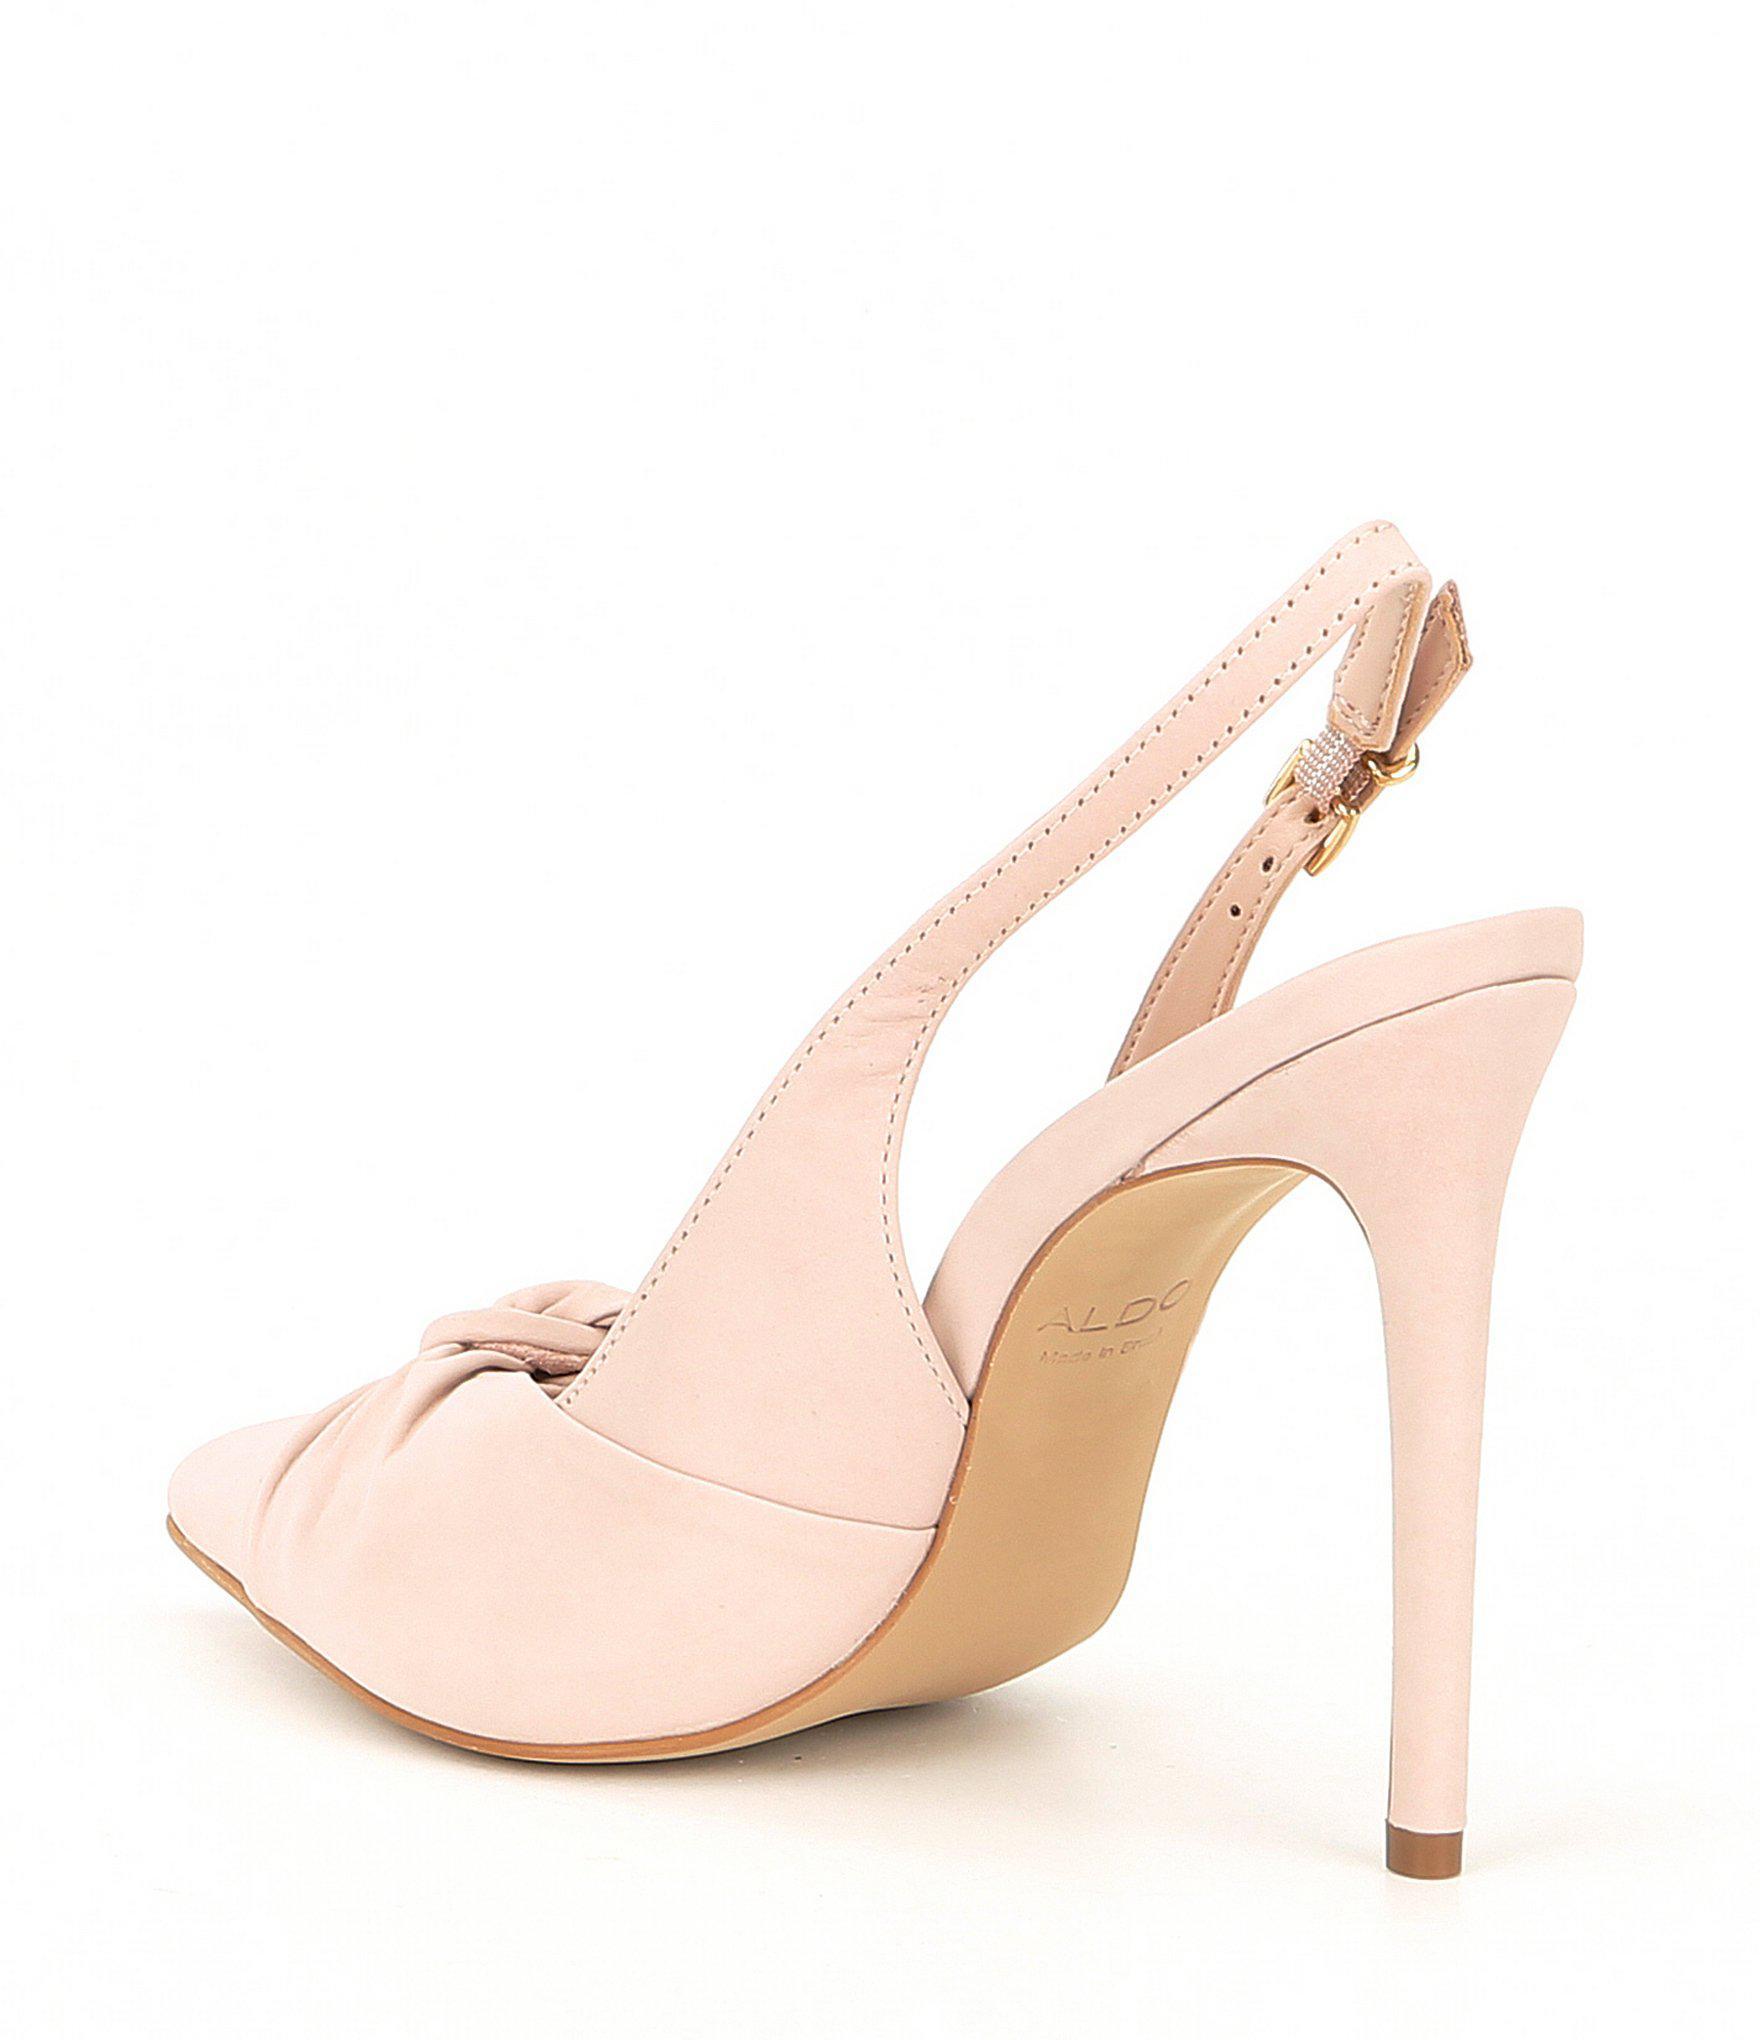 b062ebac259 Lyst aldo separation leather bow slingback pumps in pink jpg 1760x2040 Pink  slingback pumps shoes aldo